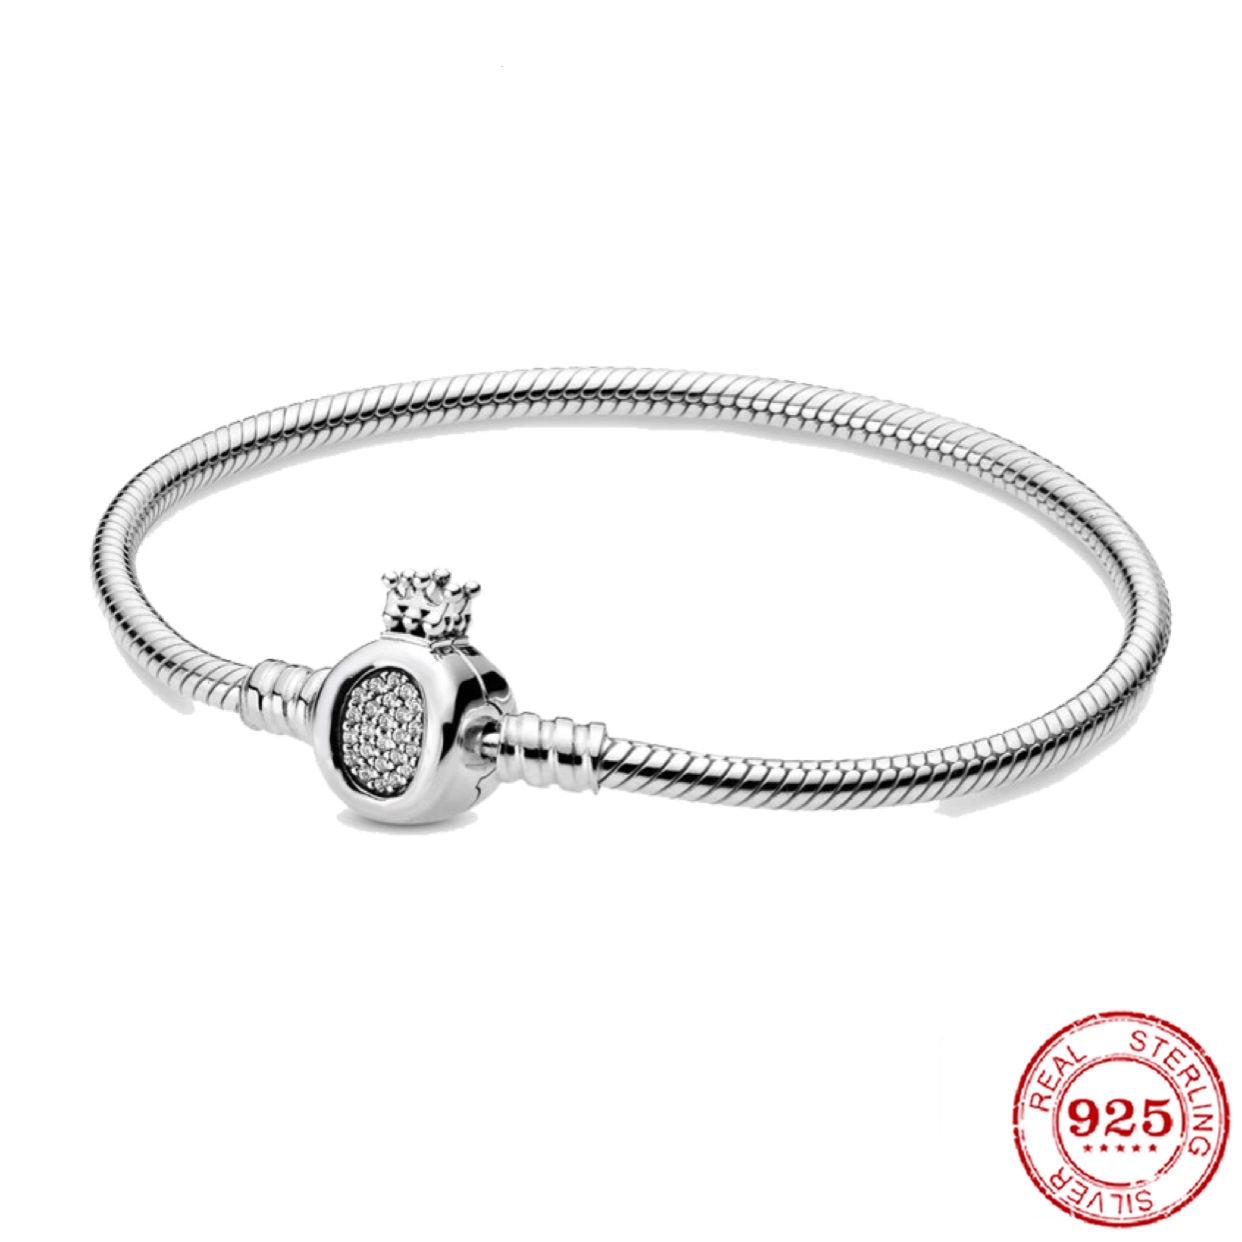 Pulsera de plata de ley 925 con diseño Original para mujer... abalorio...